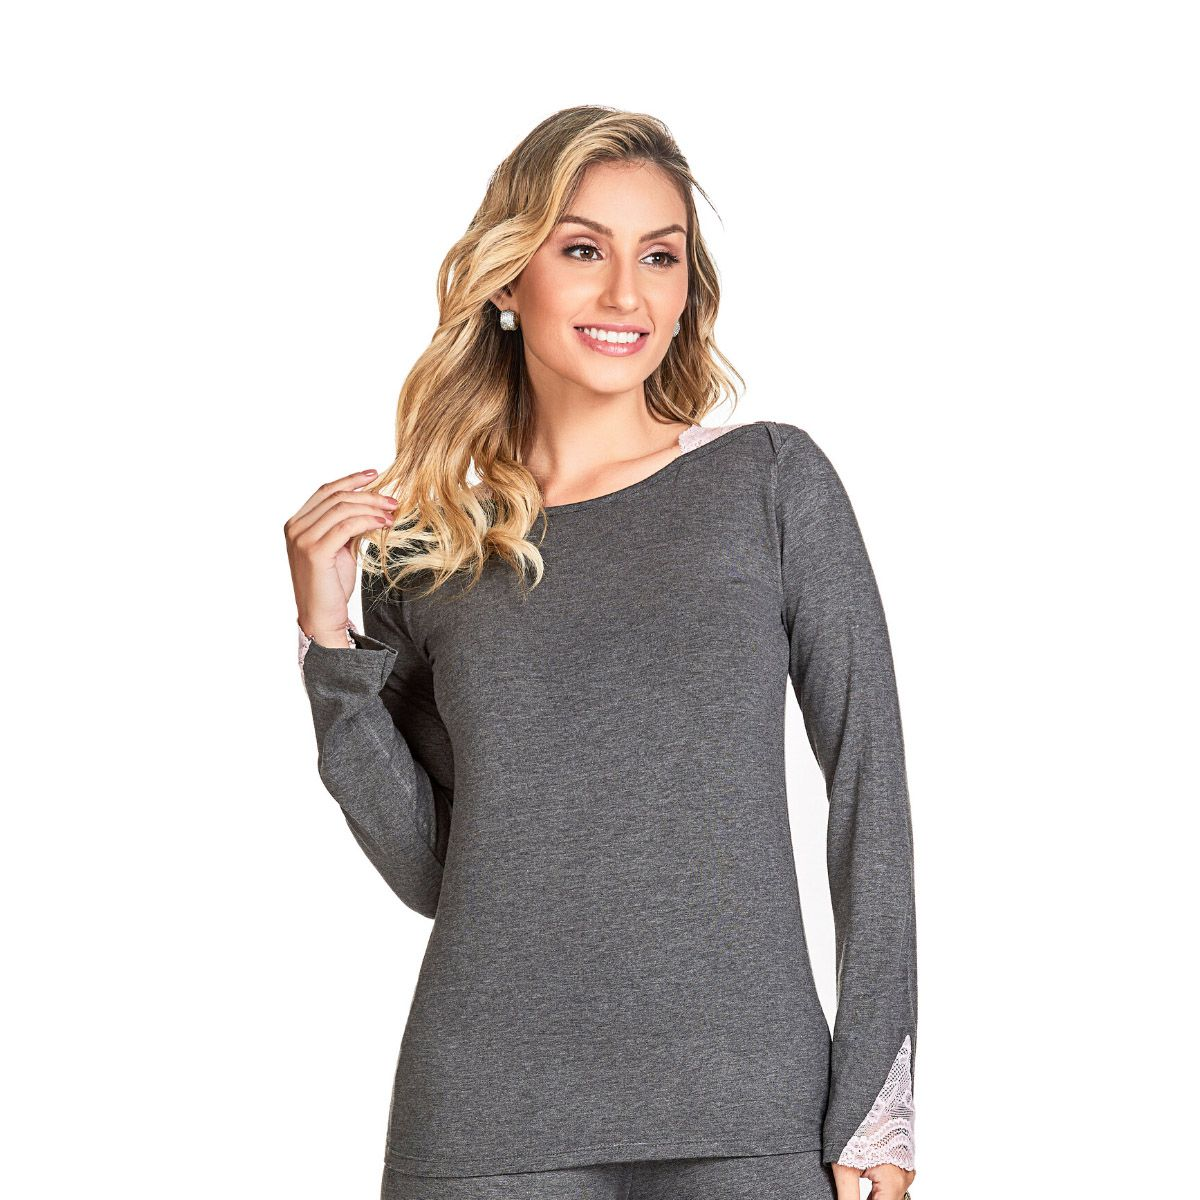 Pijama feminino inverno mescla detalhe renda ombro punho